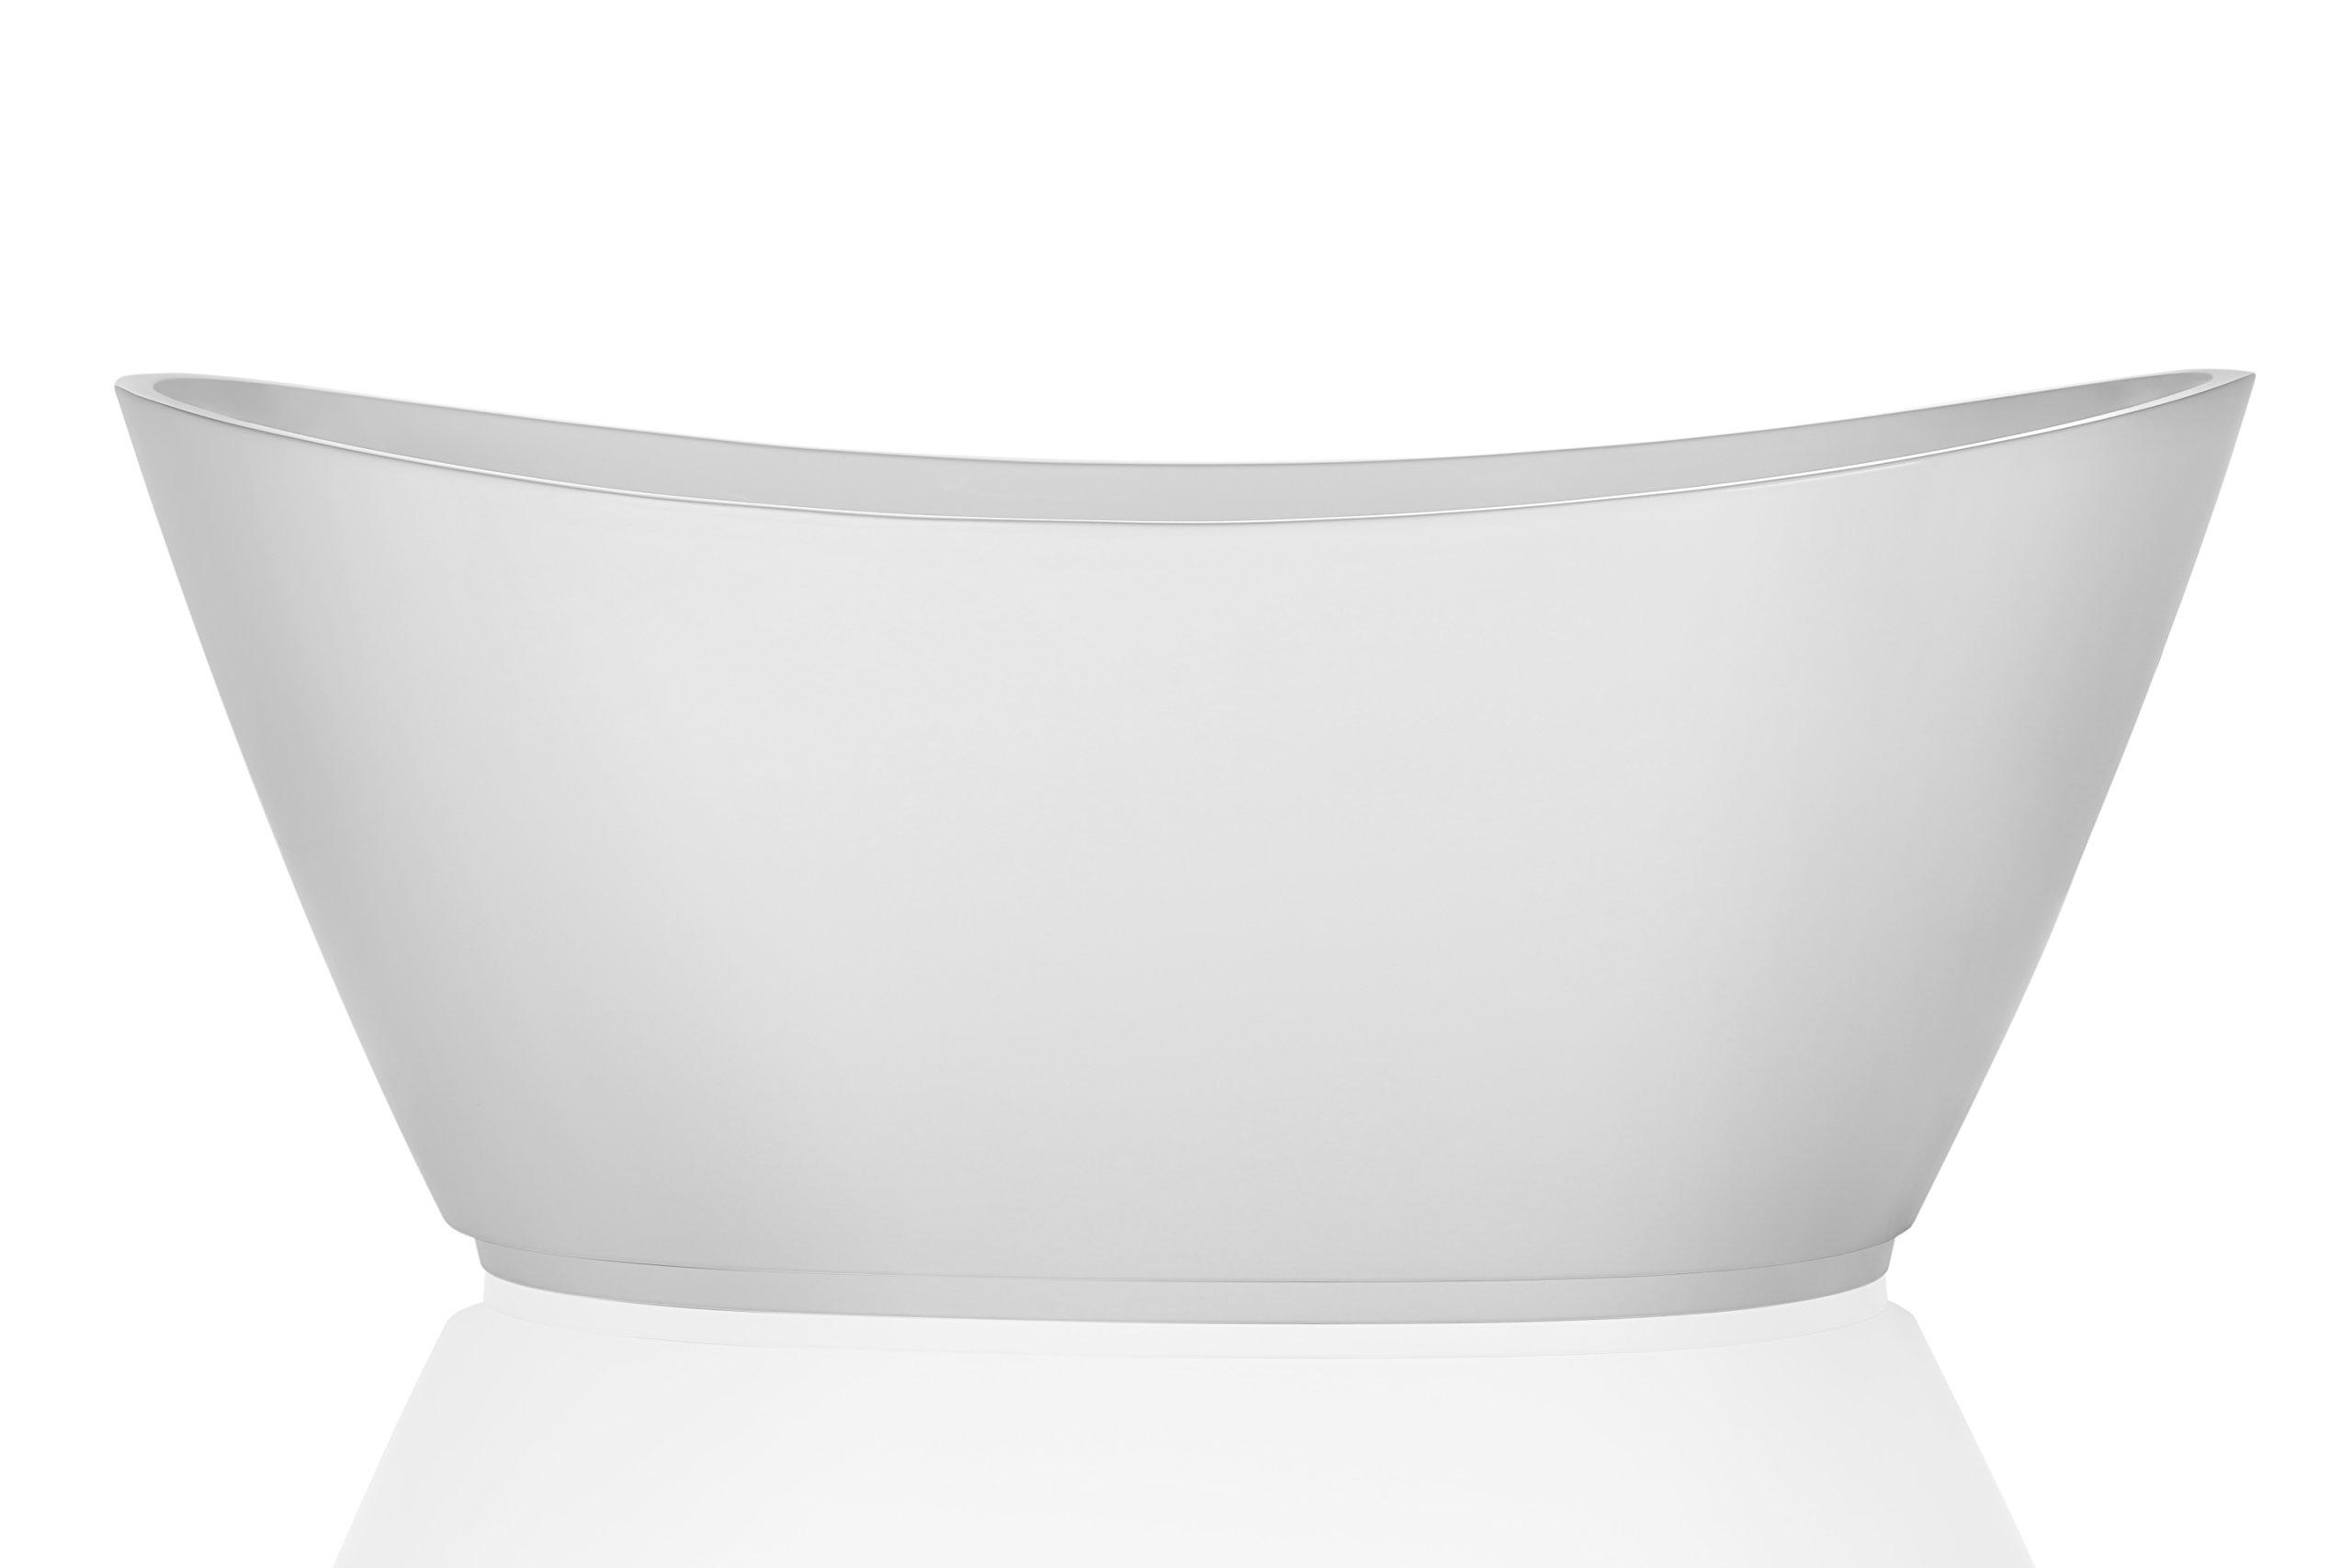 Empava 69'' Luxury Bathroom Series Acrylic Freestanding Bathtub Contemporary Soaking SPA Tub EMPV-FT1603 by Empava (Image #1)